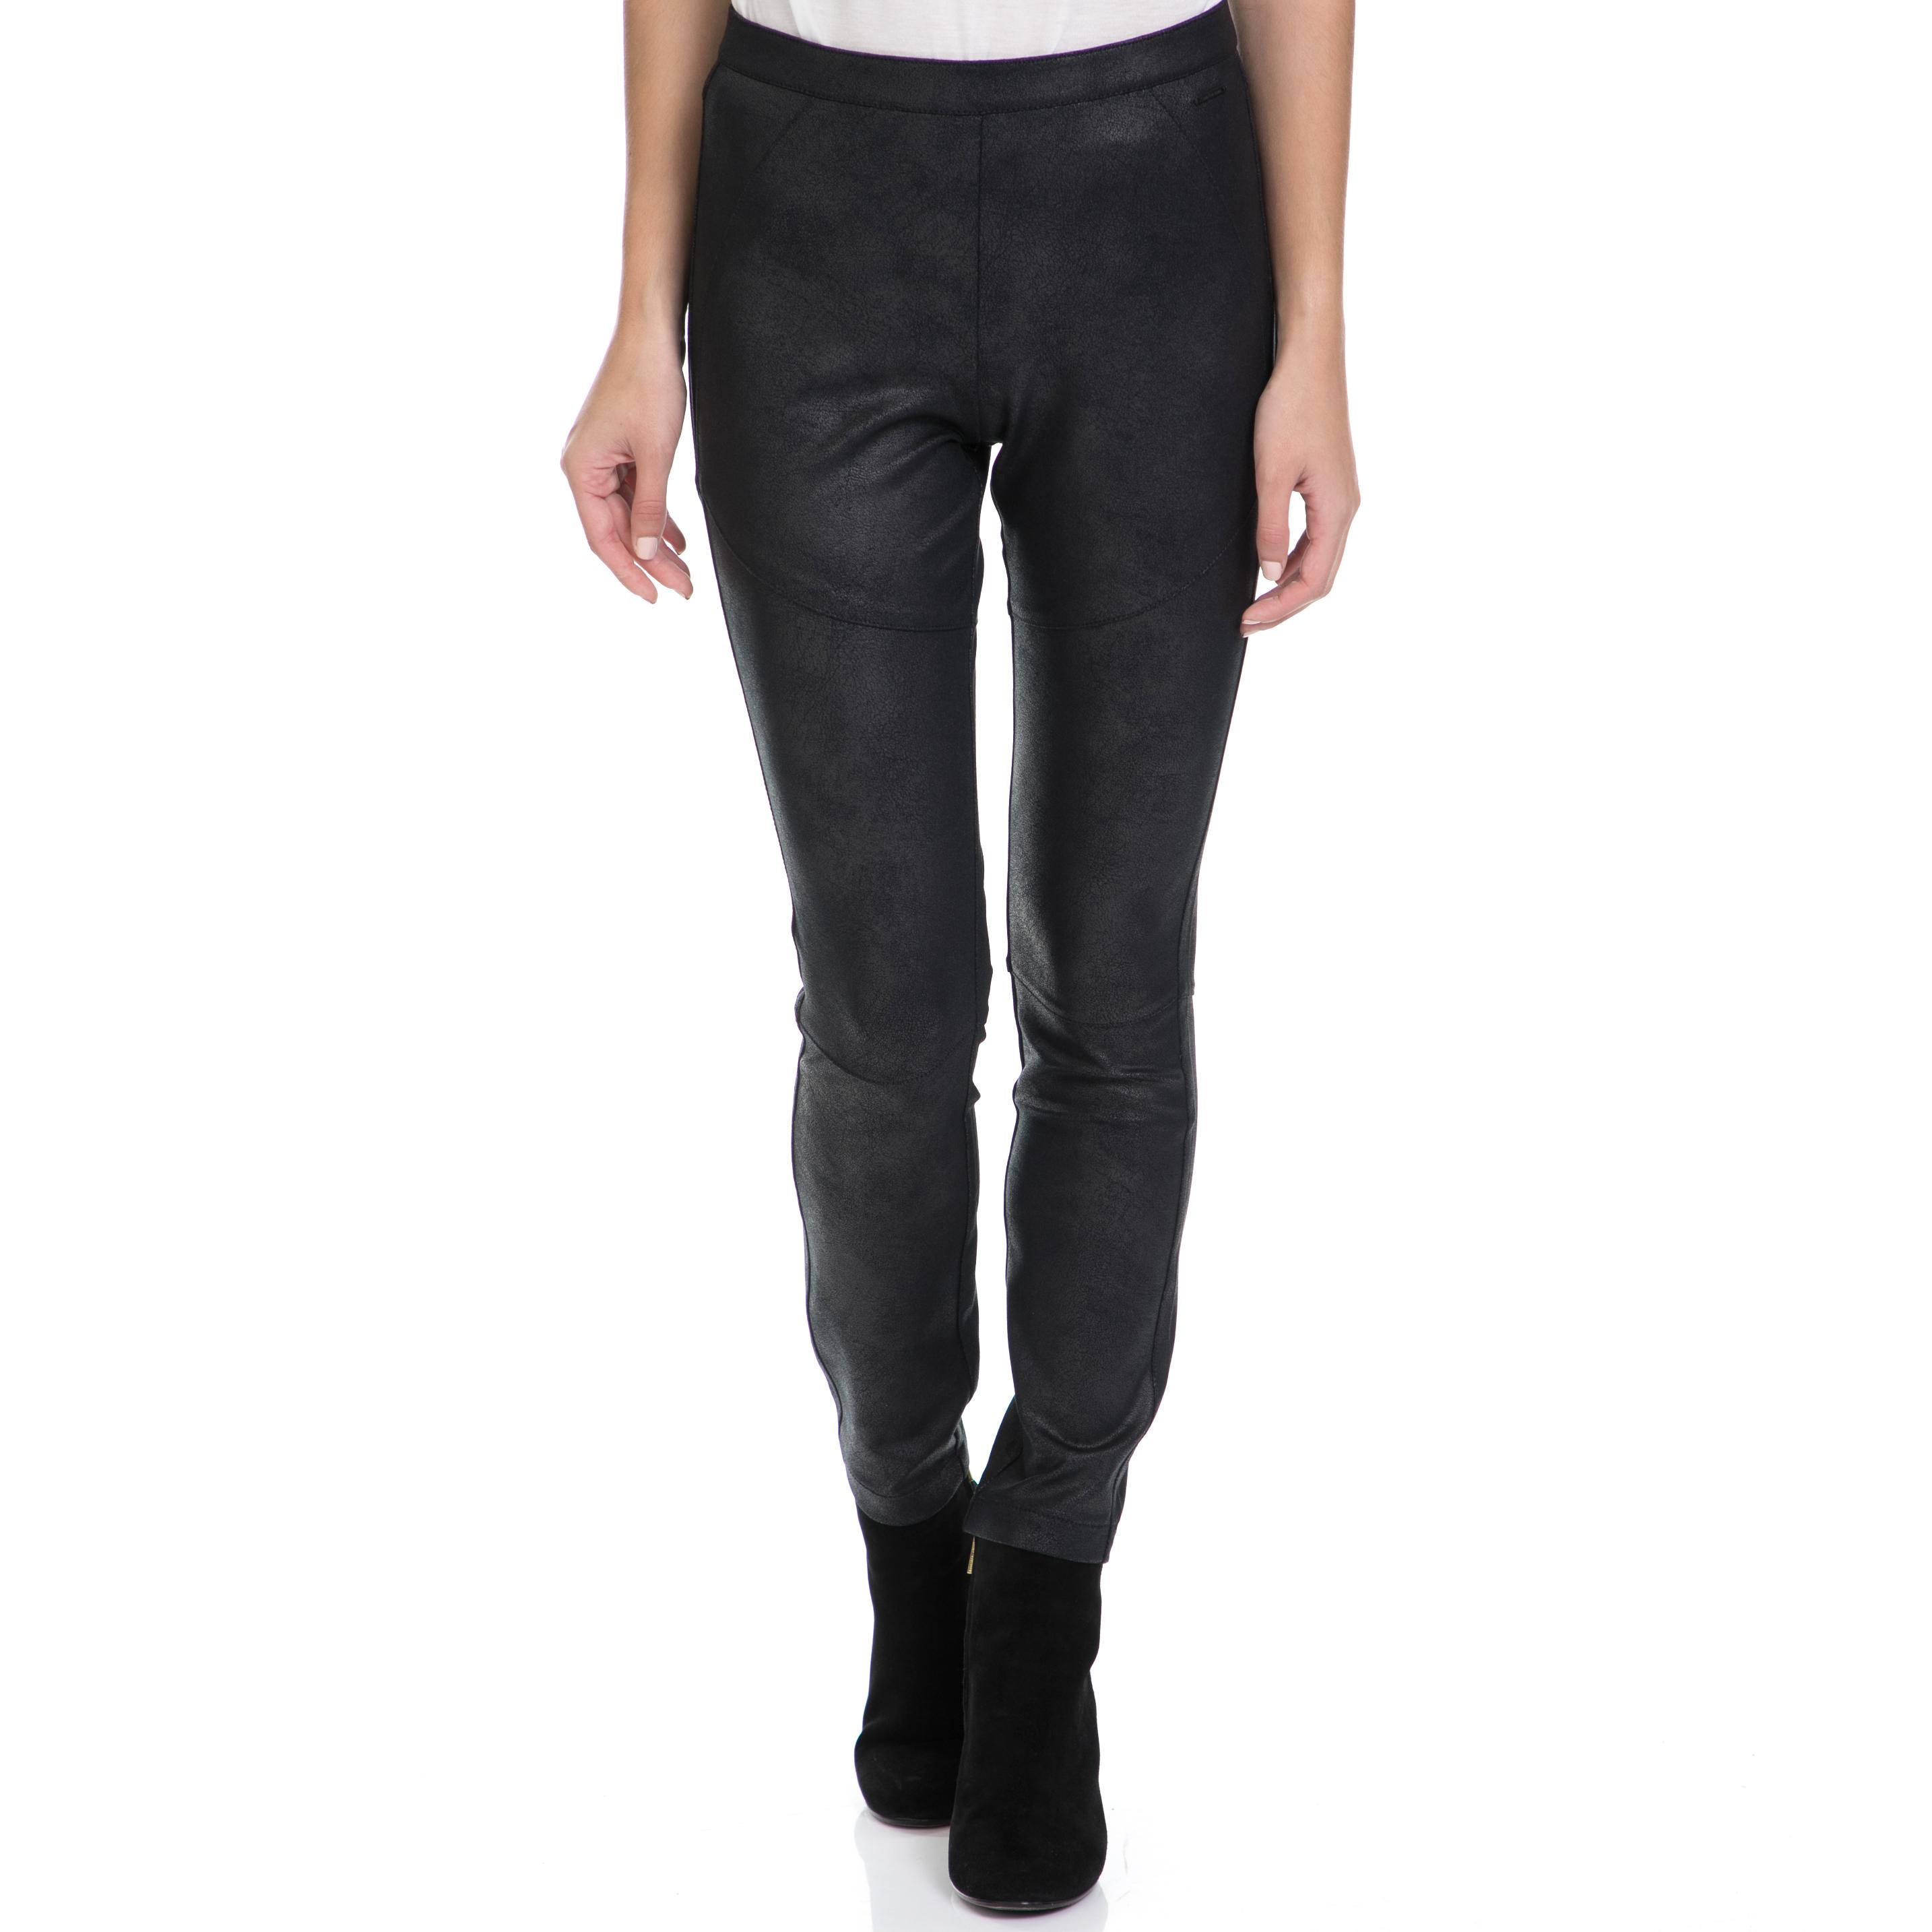 CALVIN KLEIN JEANS - Γυναικείο παντελόνι POMAR HWK COATED MILANO μαύρο γυναικεία ρούχα παντελόνια skinny